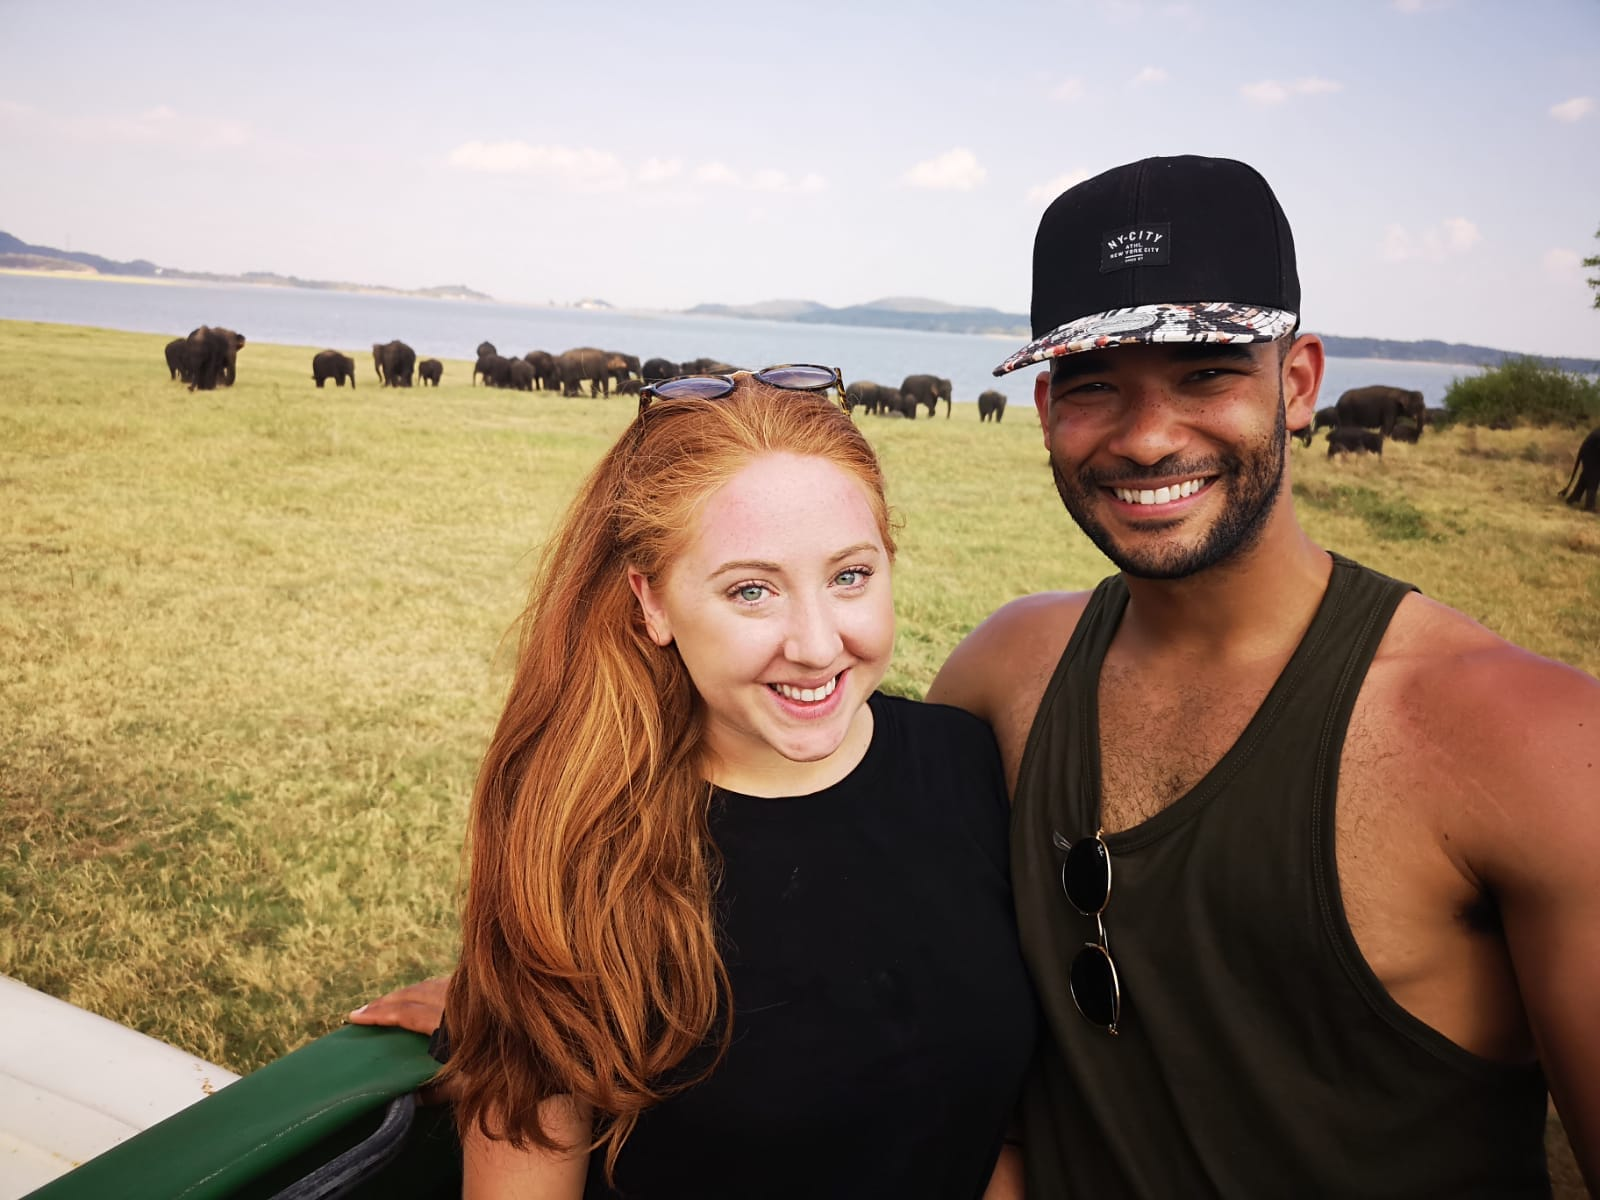 invite-to-paradise-sri-lanka-holiday-honeymoon-specialists-customer-feedback-elin-jordan-luce-wildlife-safari.JPG